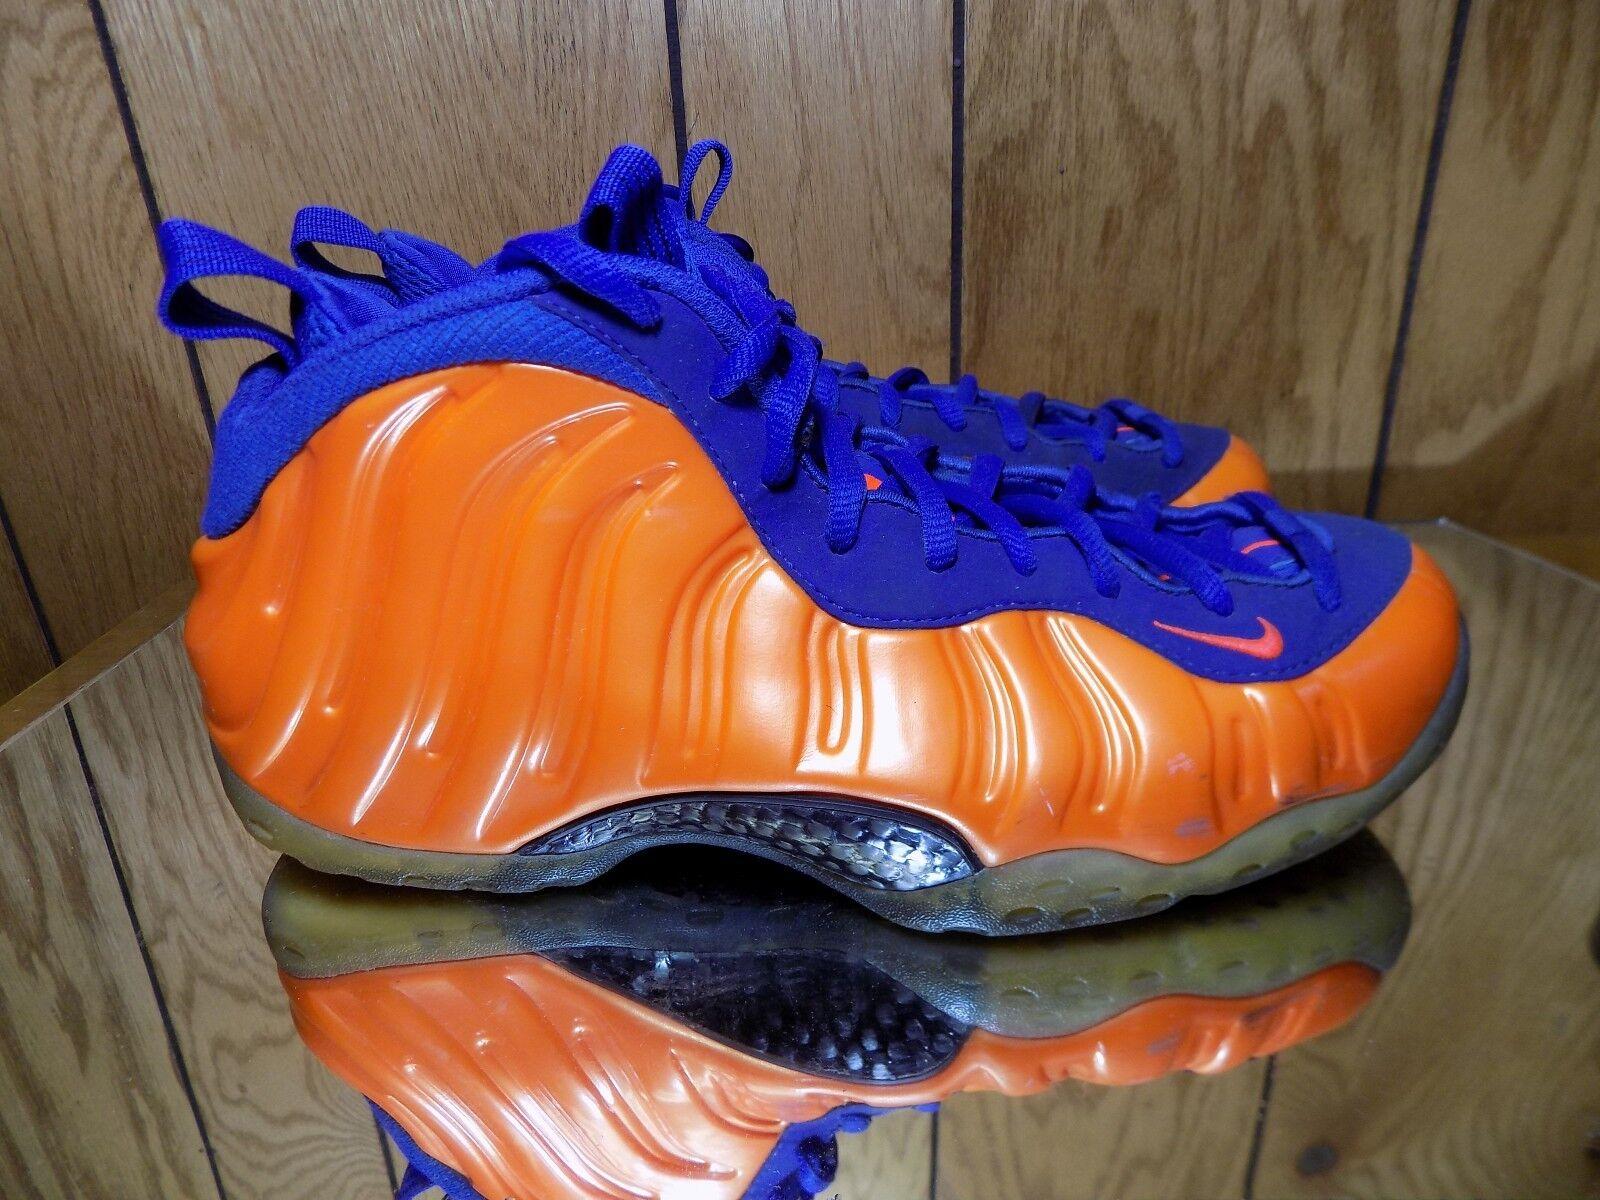 Nike Mens Air Foamposite One 314996-801 bluee orange New York Size 9